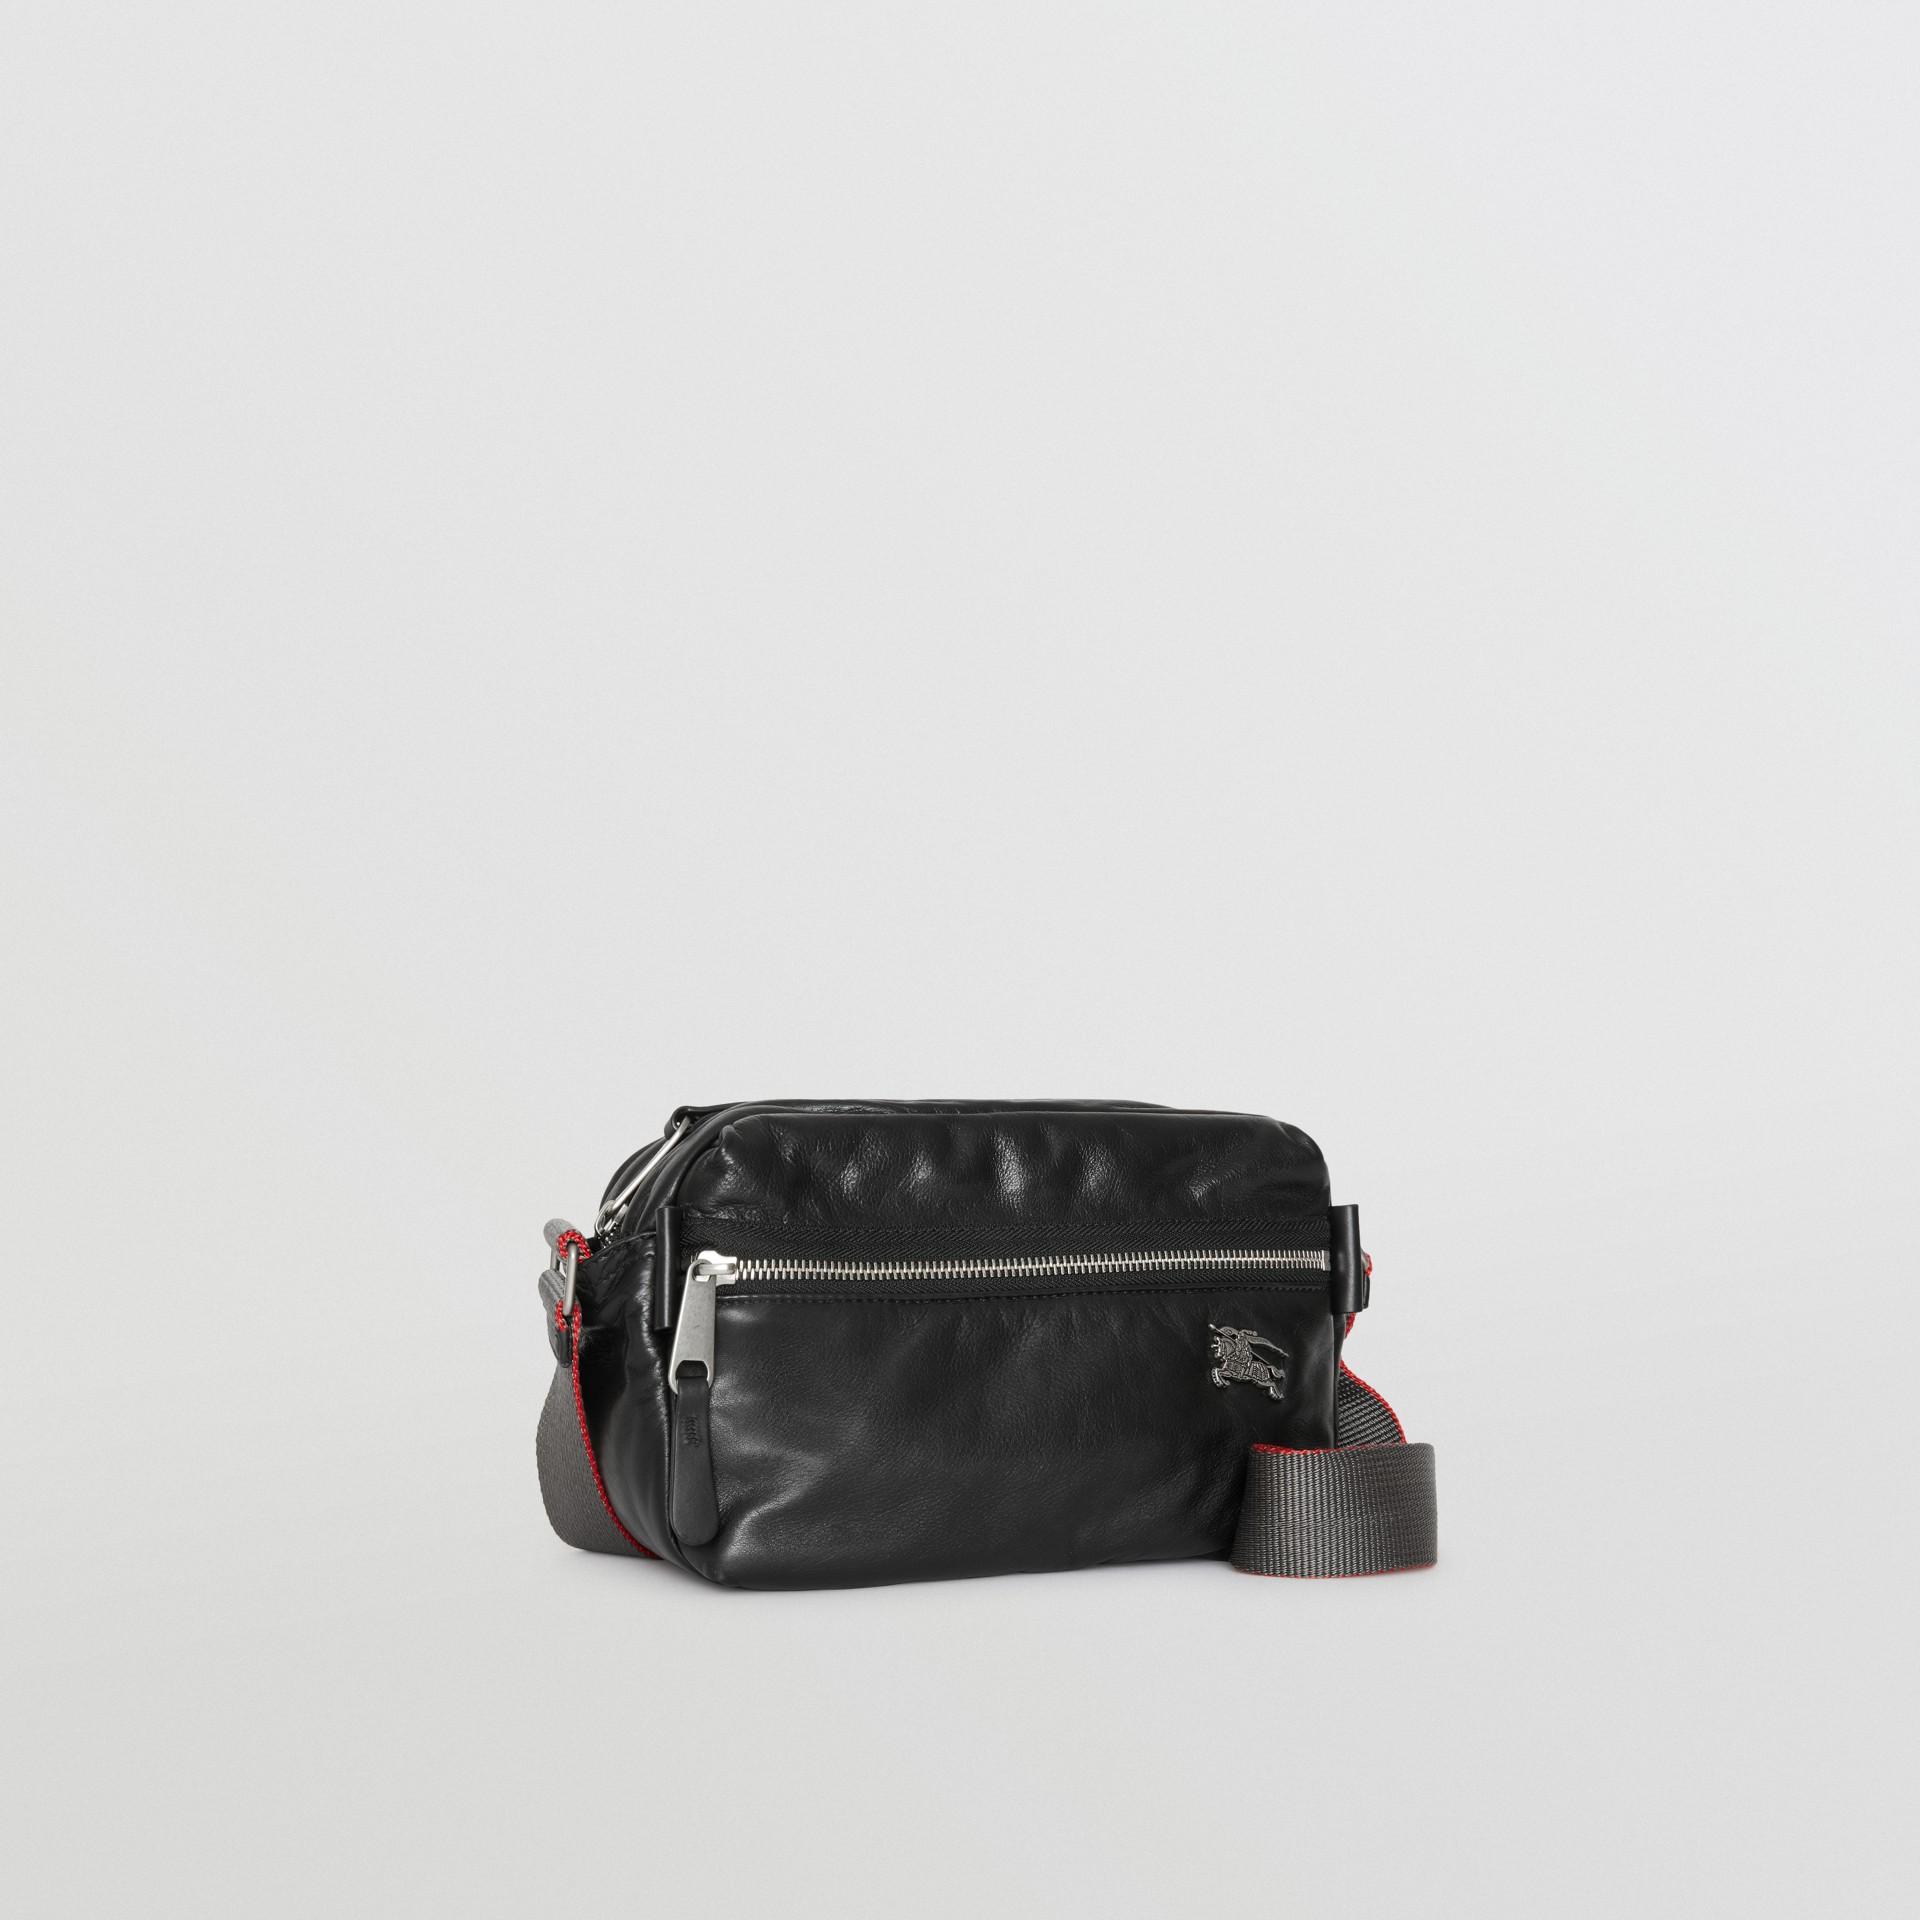 EKD Nappa Leather Crossbody Bag in Black - Men | Burberry Hong Kong - gallery image 4